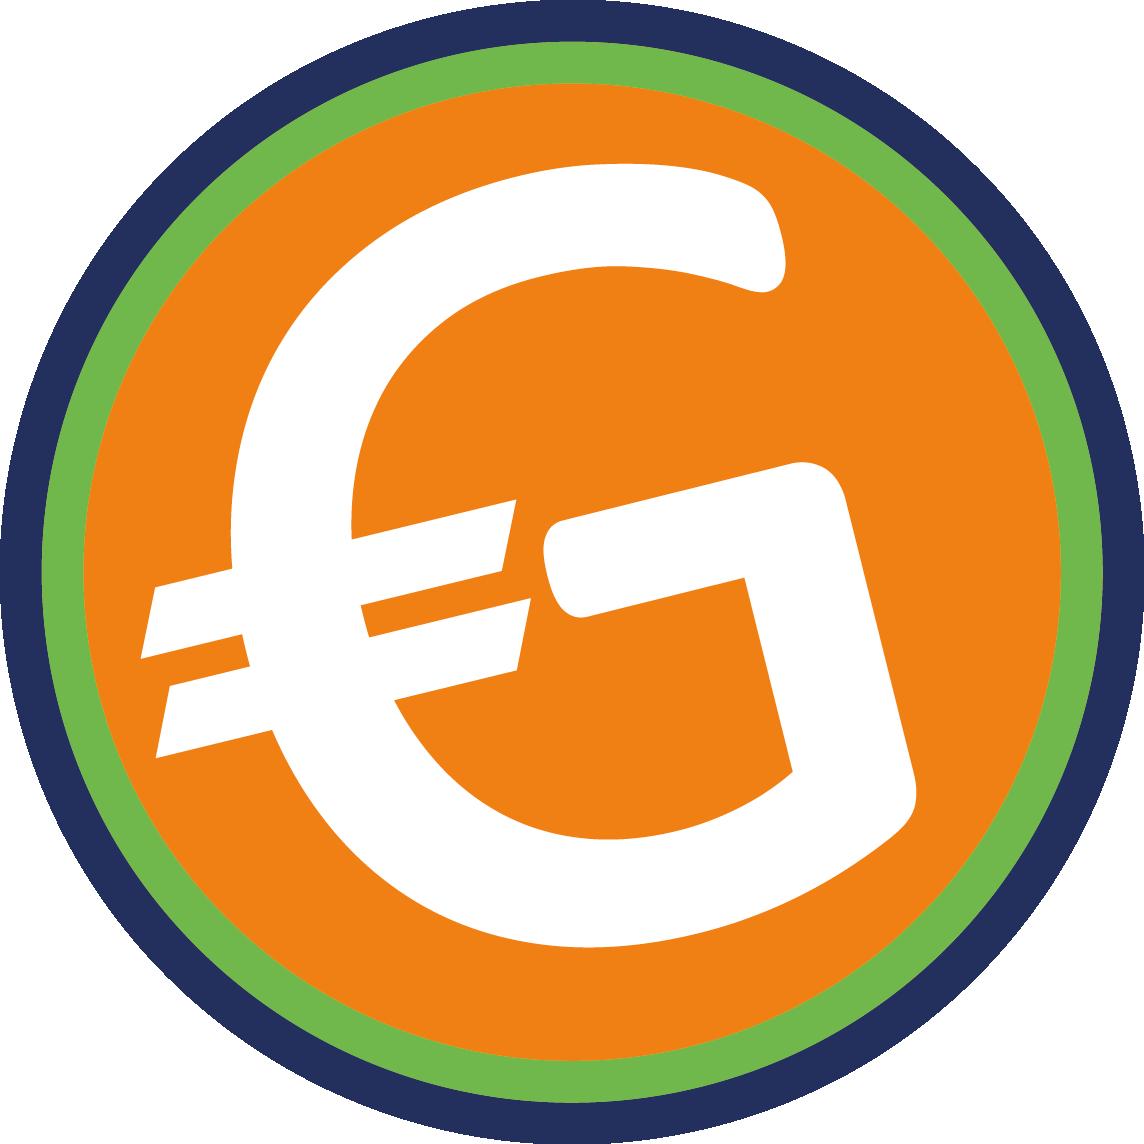 Gruppenunterkunftsgarantie (GGG)